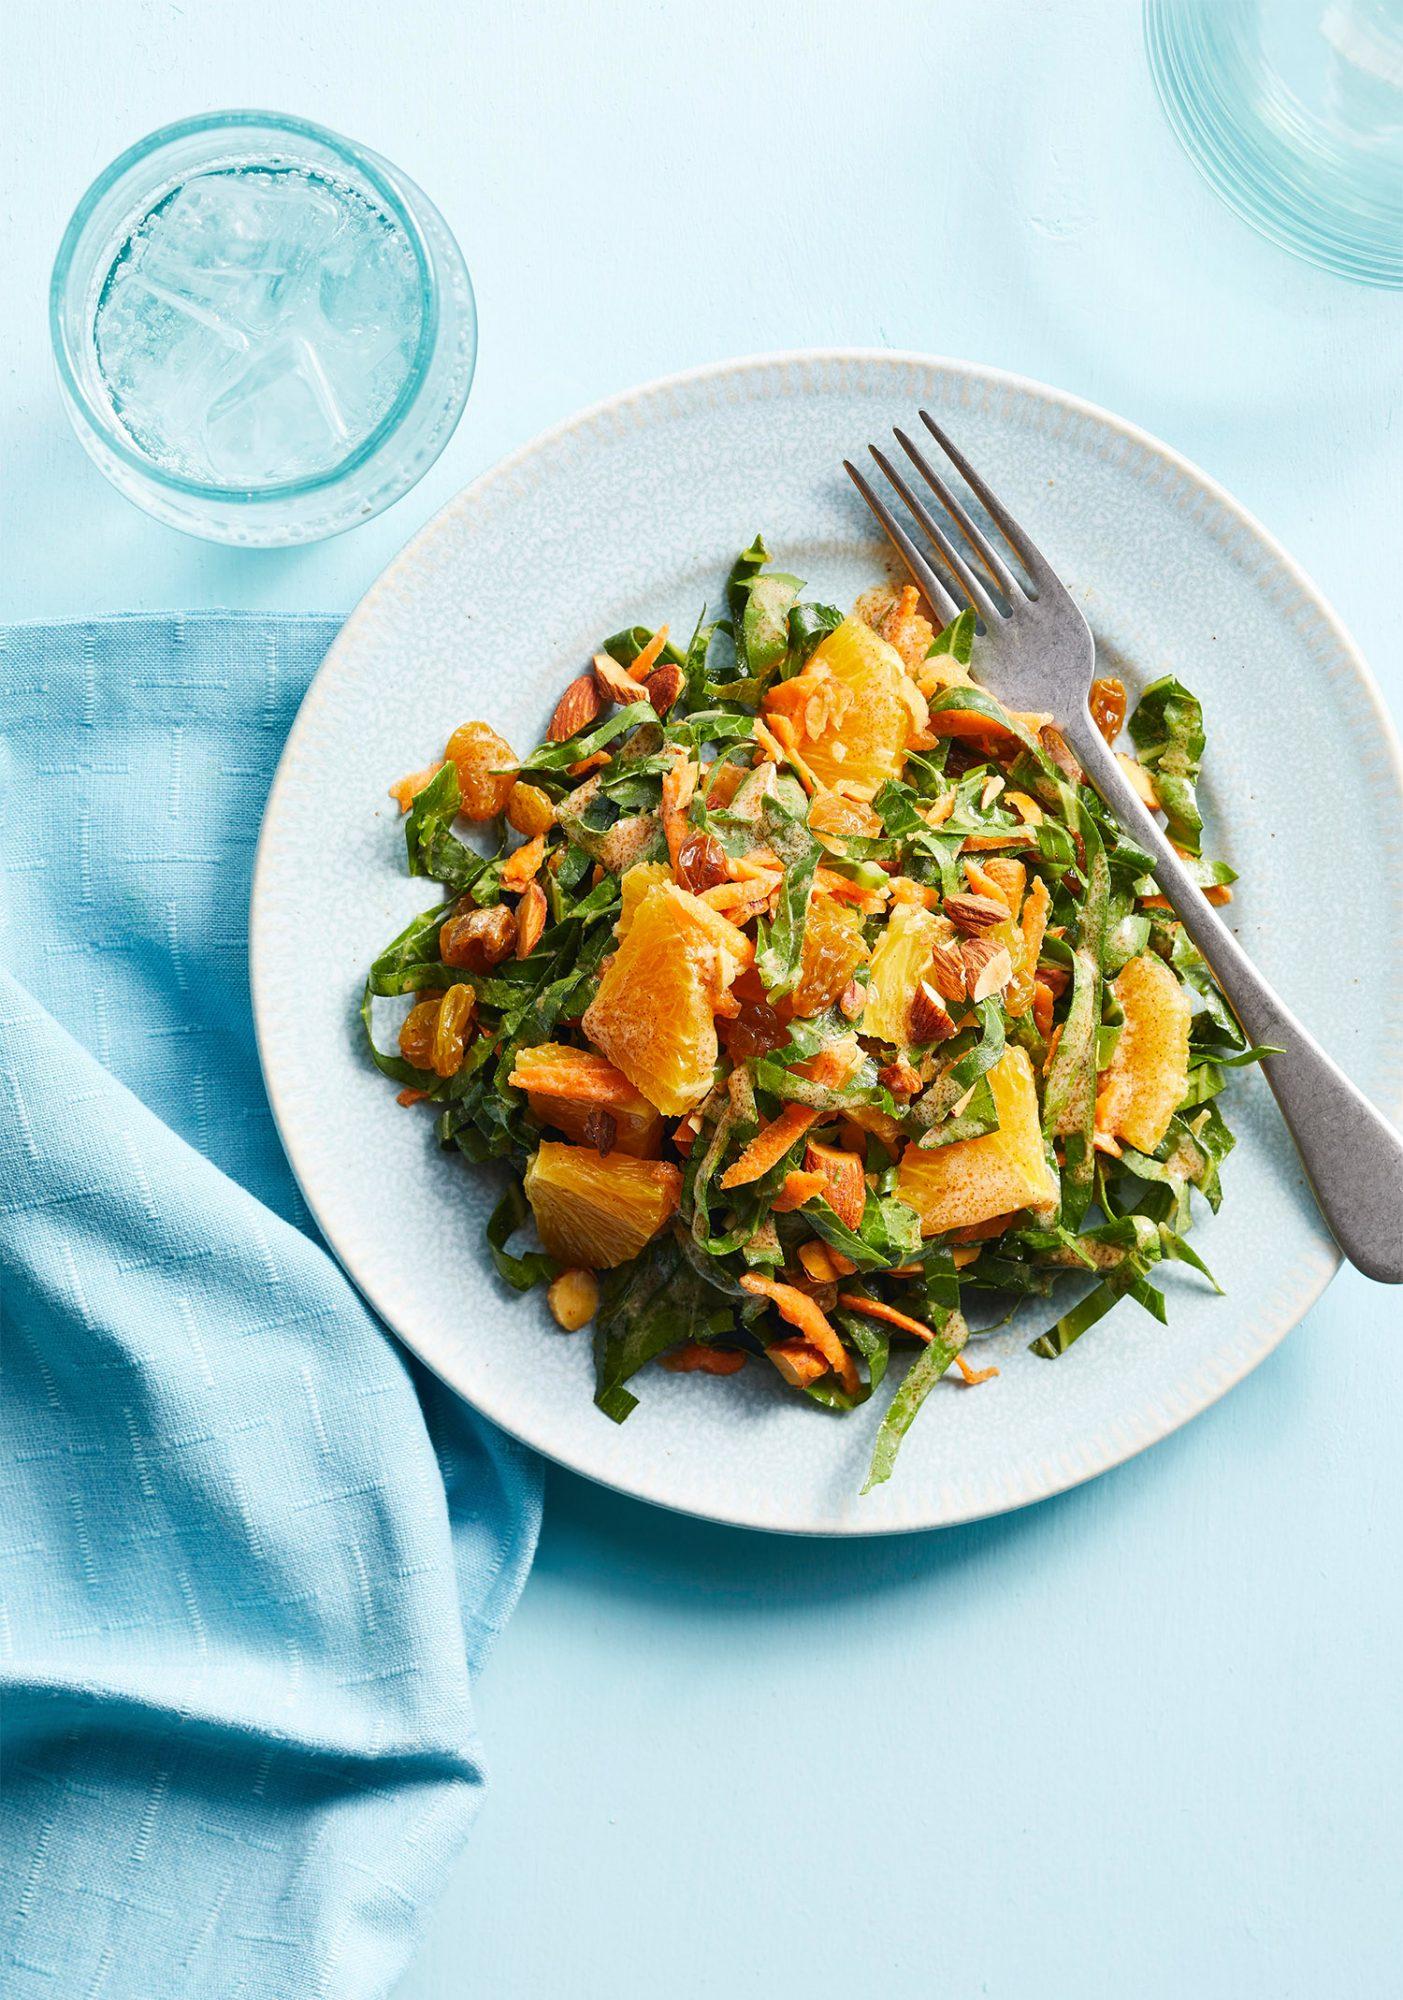 Moroccan-Style Collard Salad